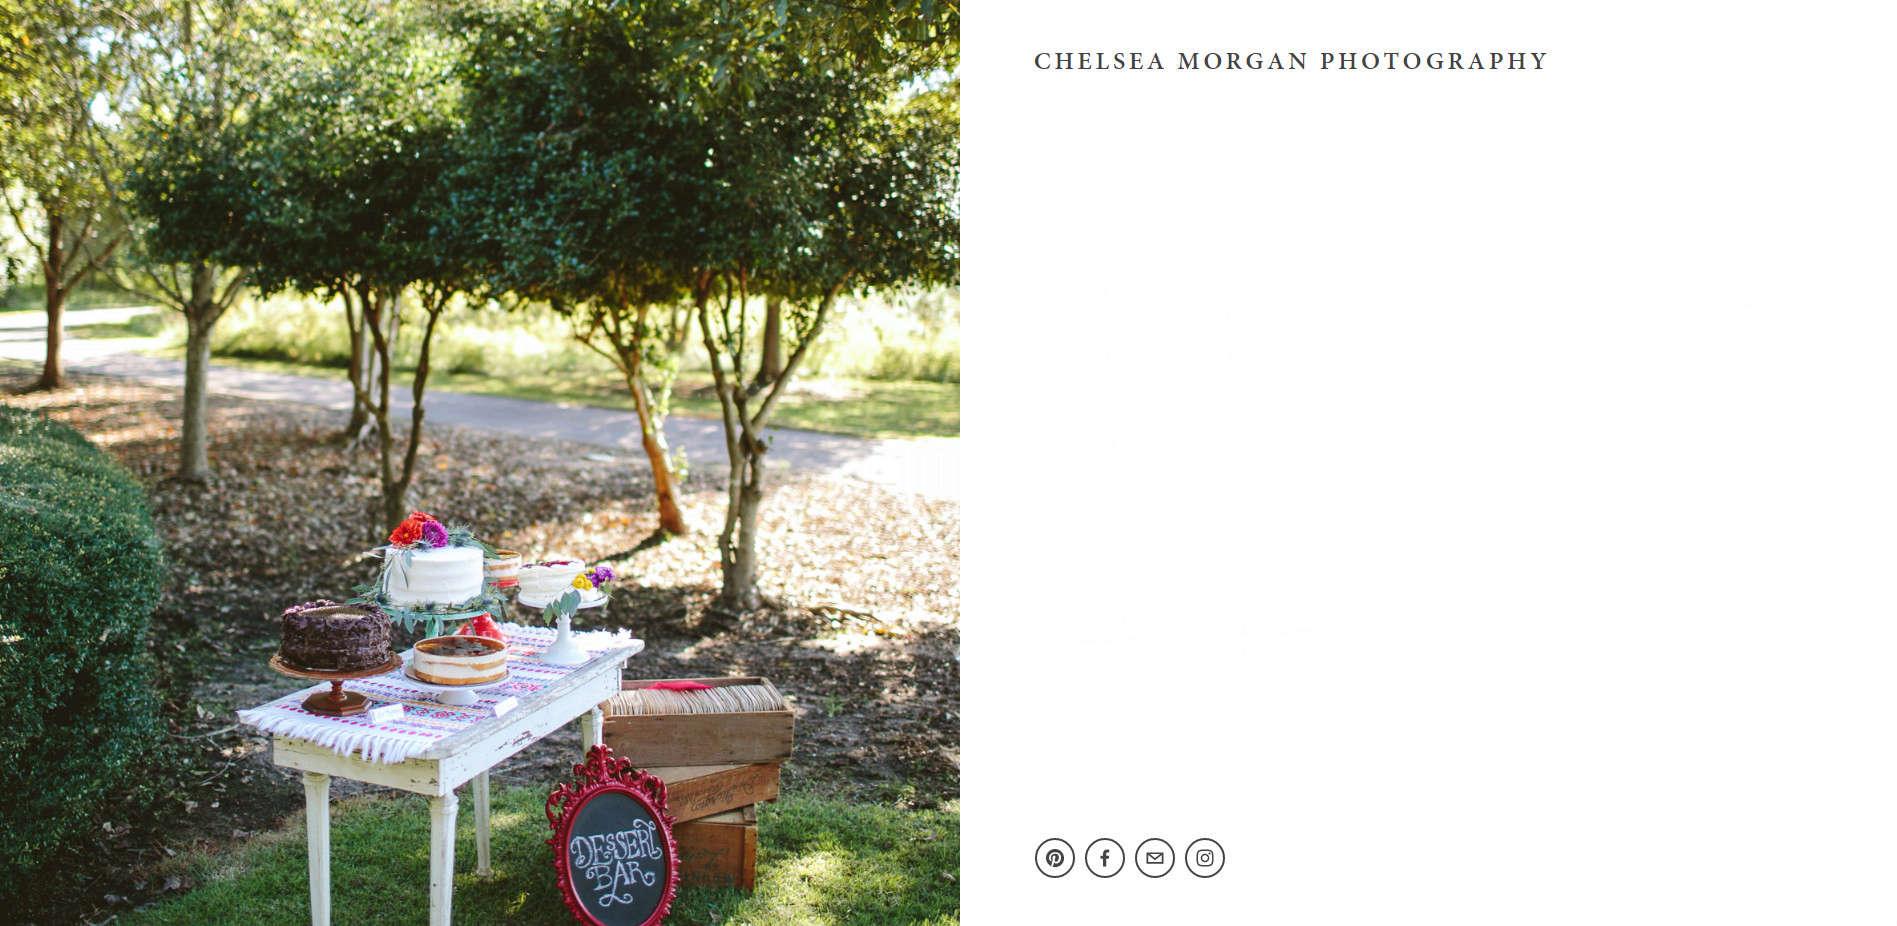 Уеб сайт на Chelsie Morgan